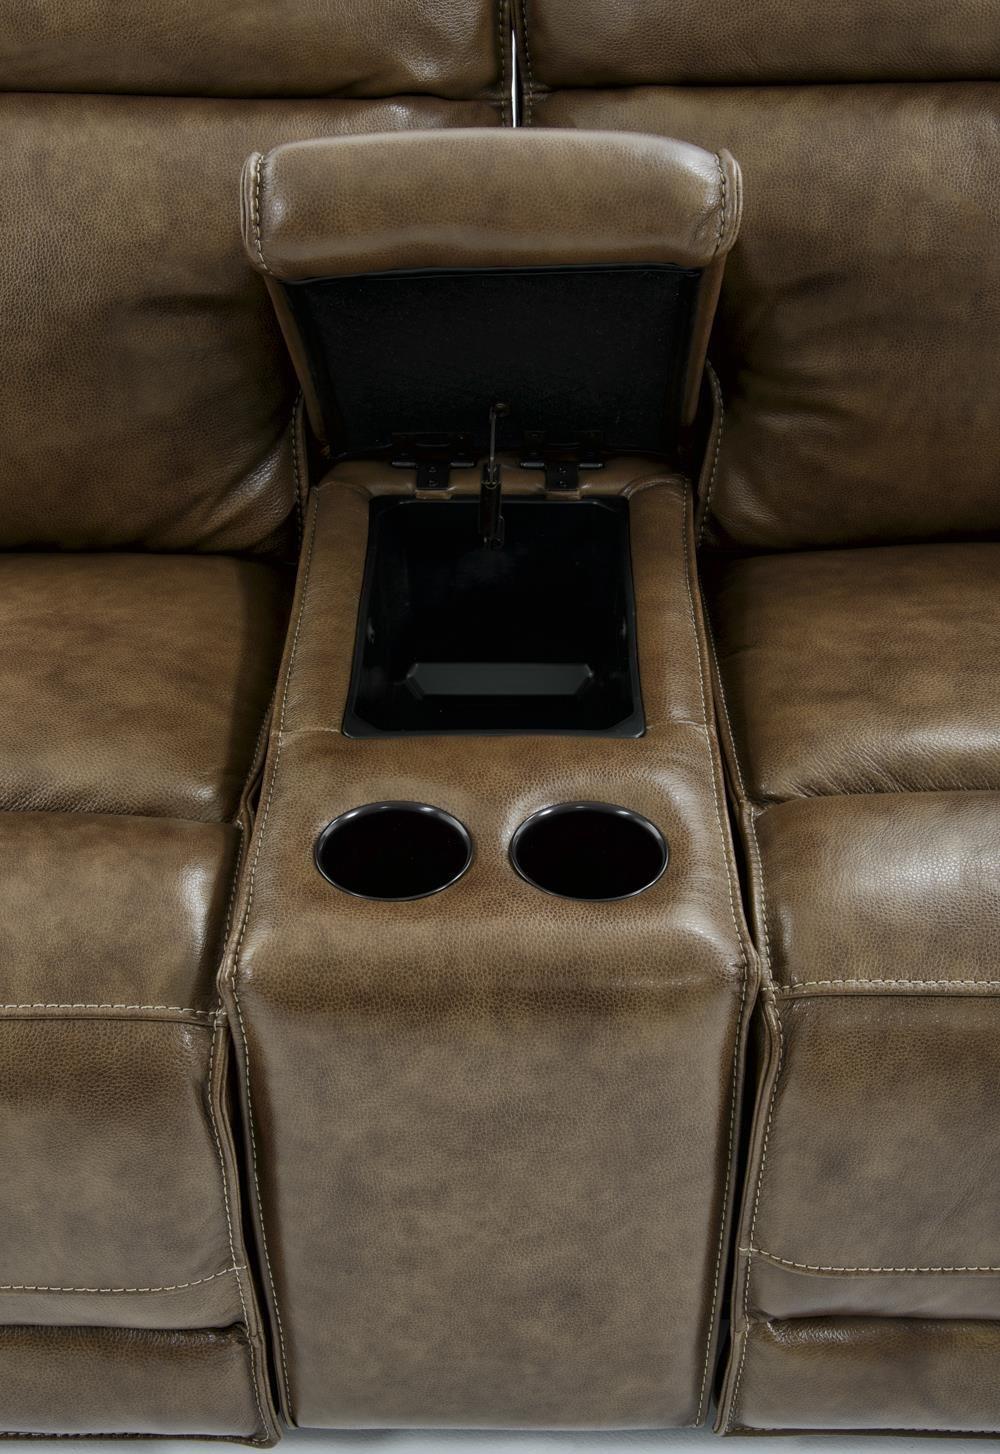 Futura Leather E1270 E1270 248 E1270 207 M1270 125 1421h